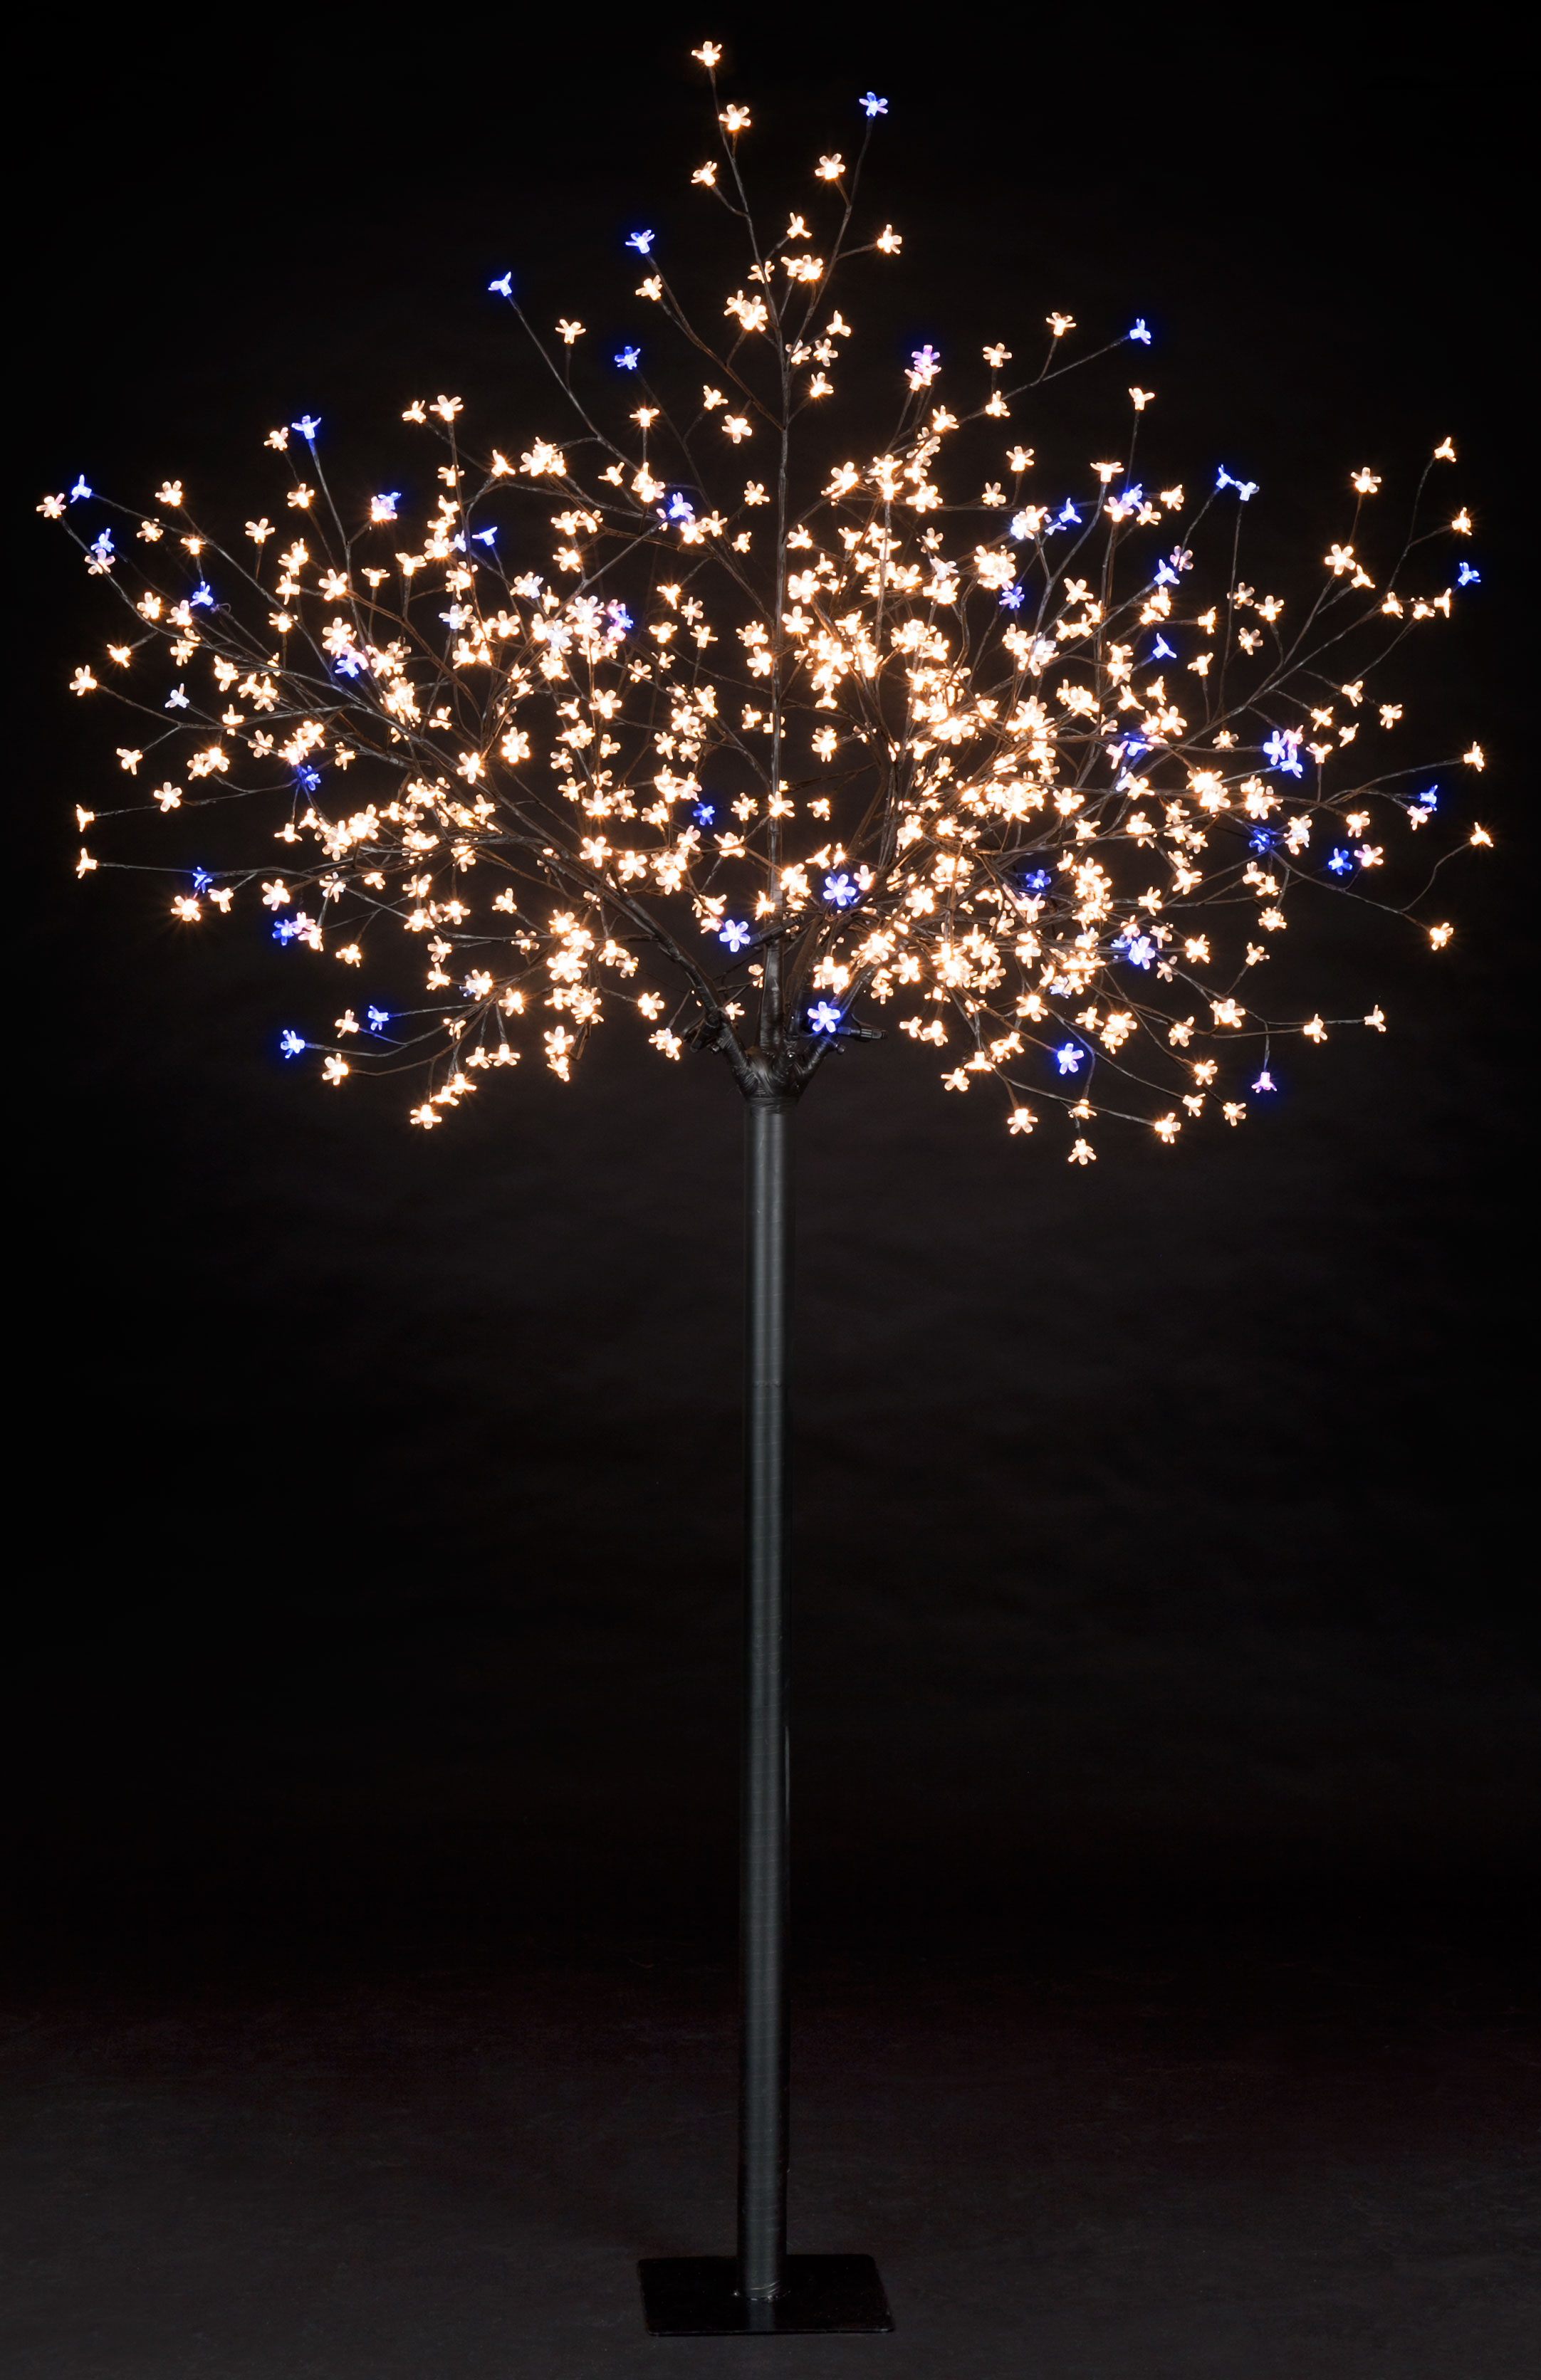 7ft Cherry Blossom Tree with 540 Warm White & 60 Ice White Flashing LEDs